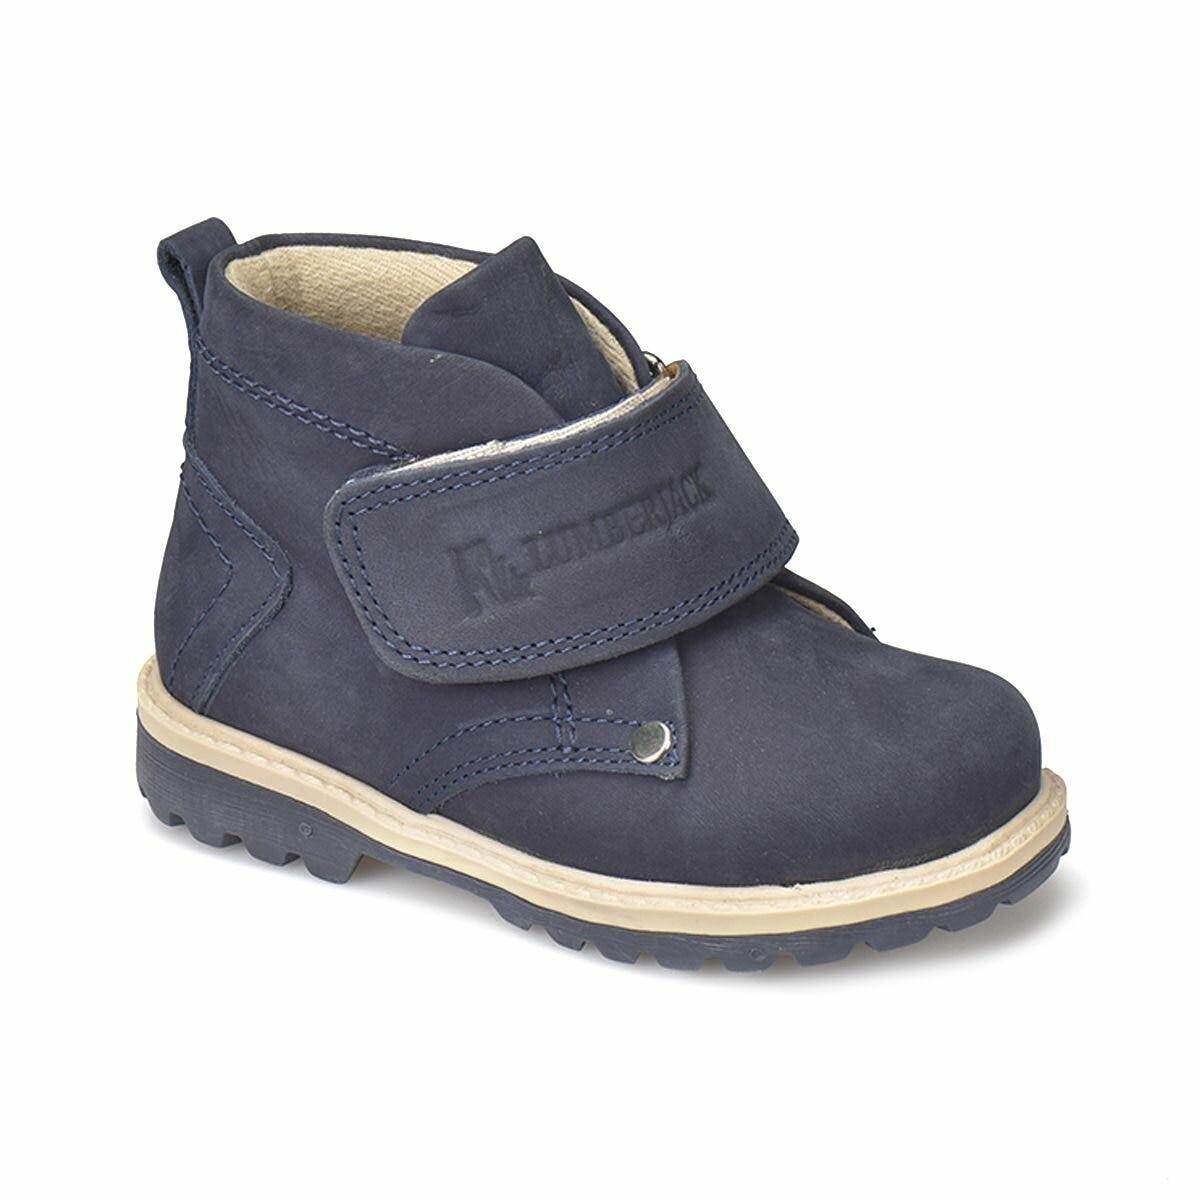 FLO ROCK Navy Blue Unisex Child Boots LUMBERJACK